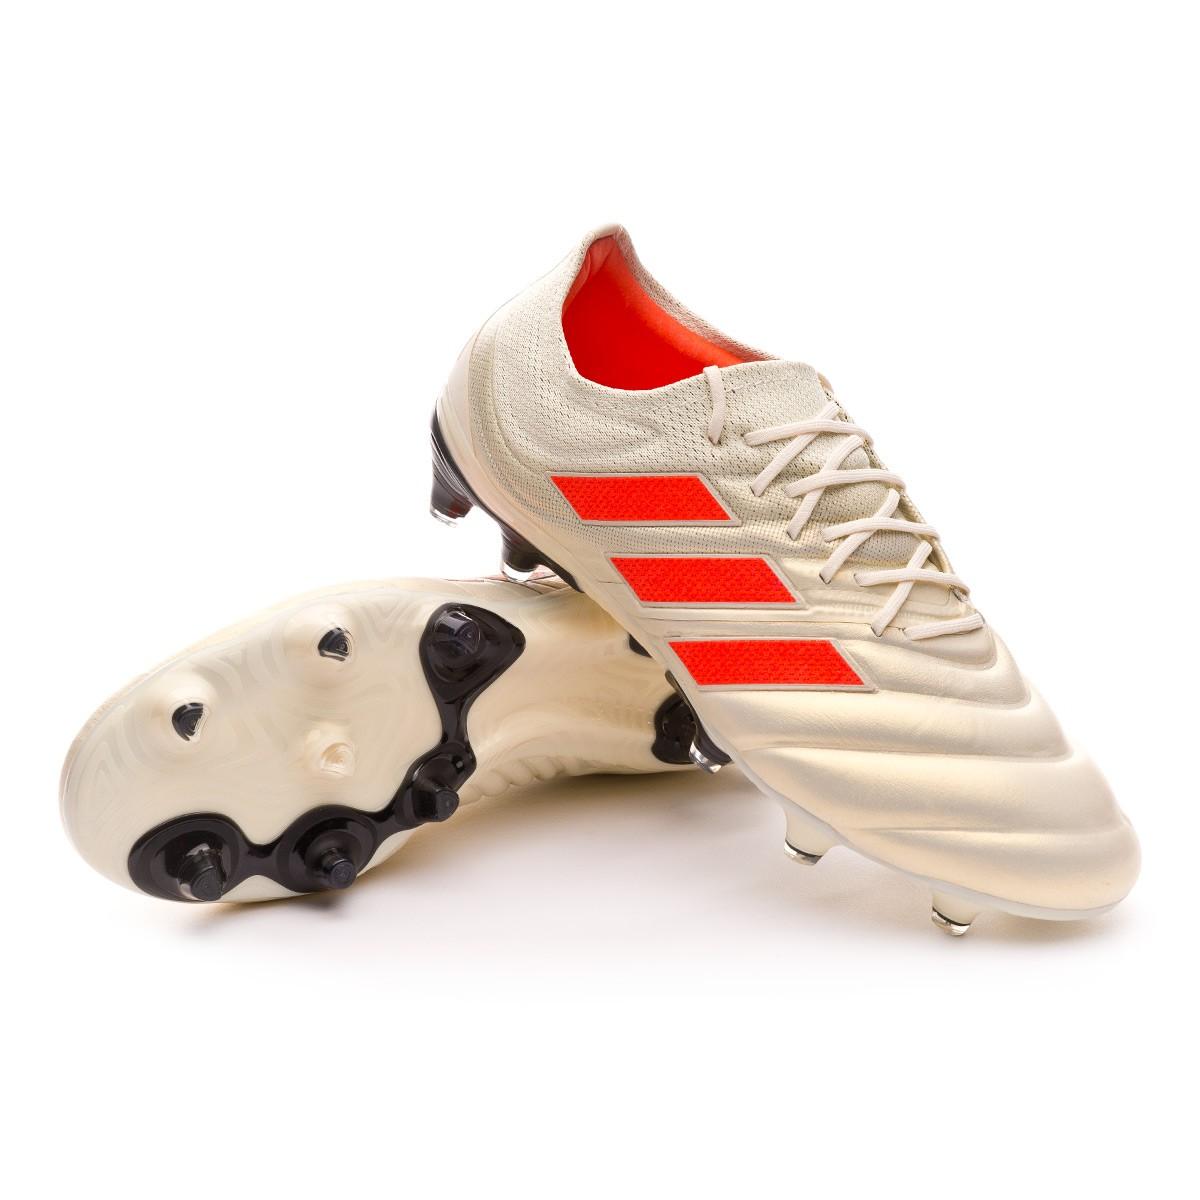 Scarpe adidas Copa 19.1 FG